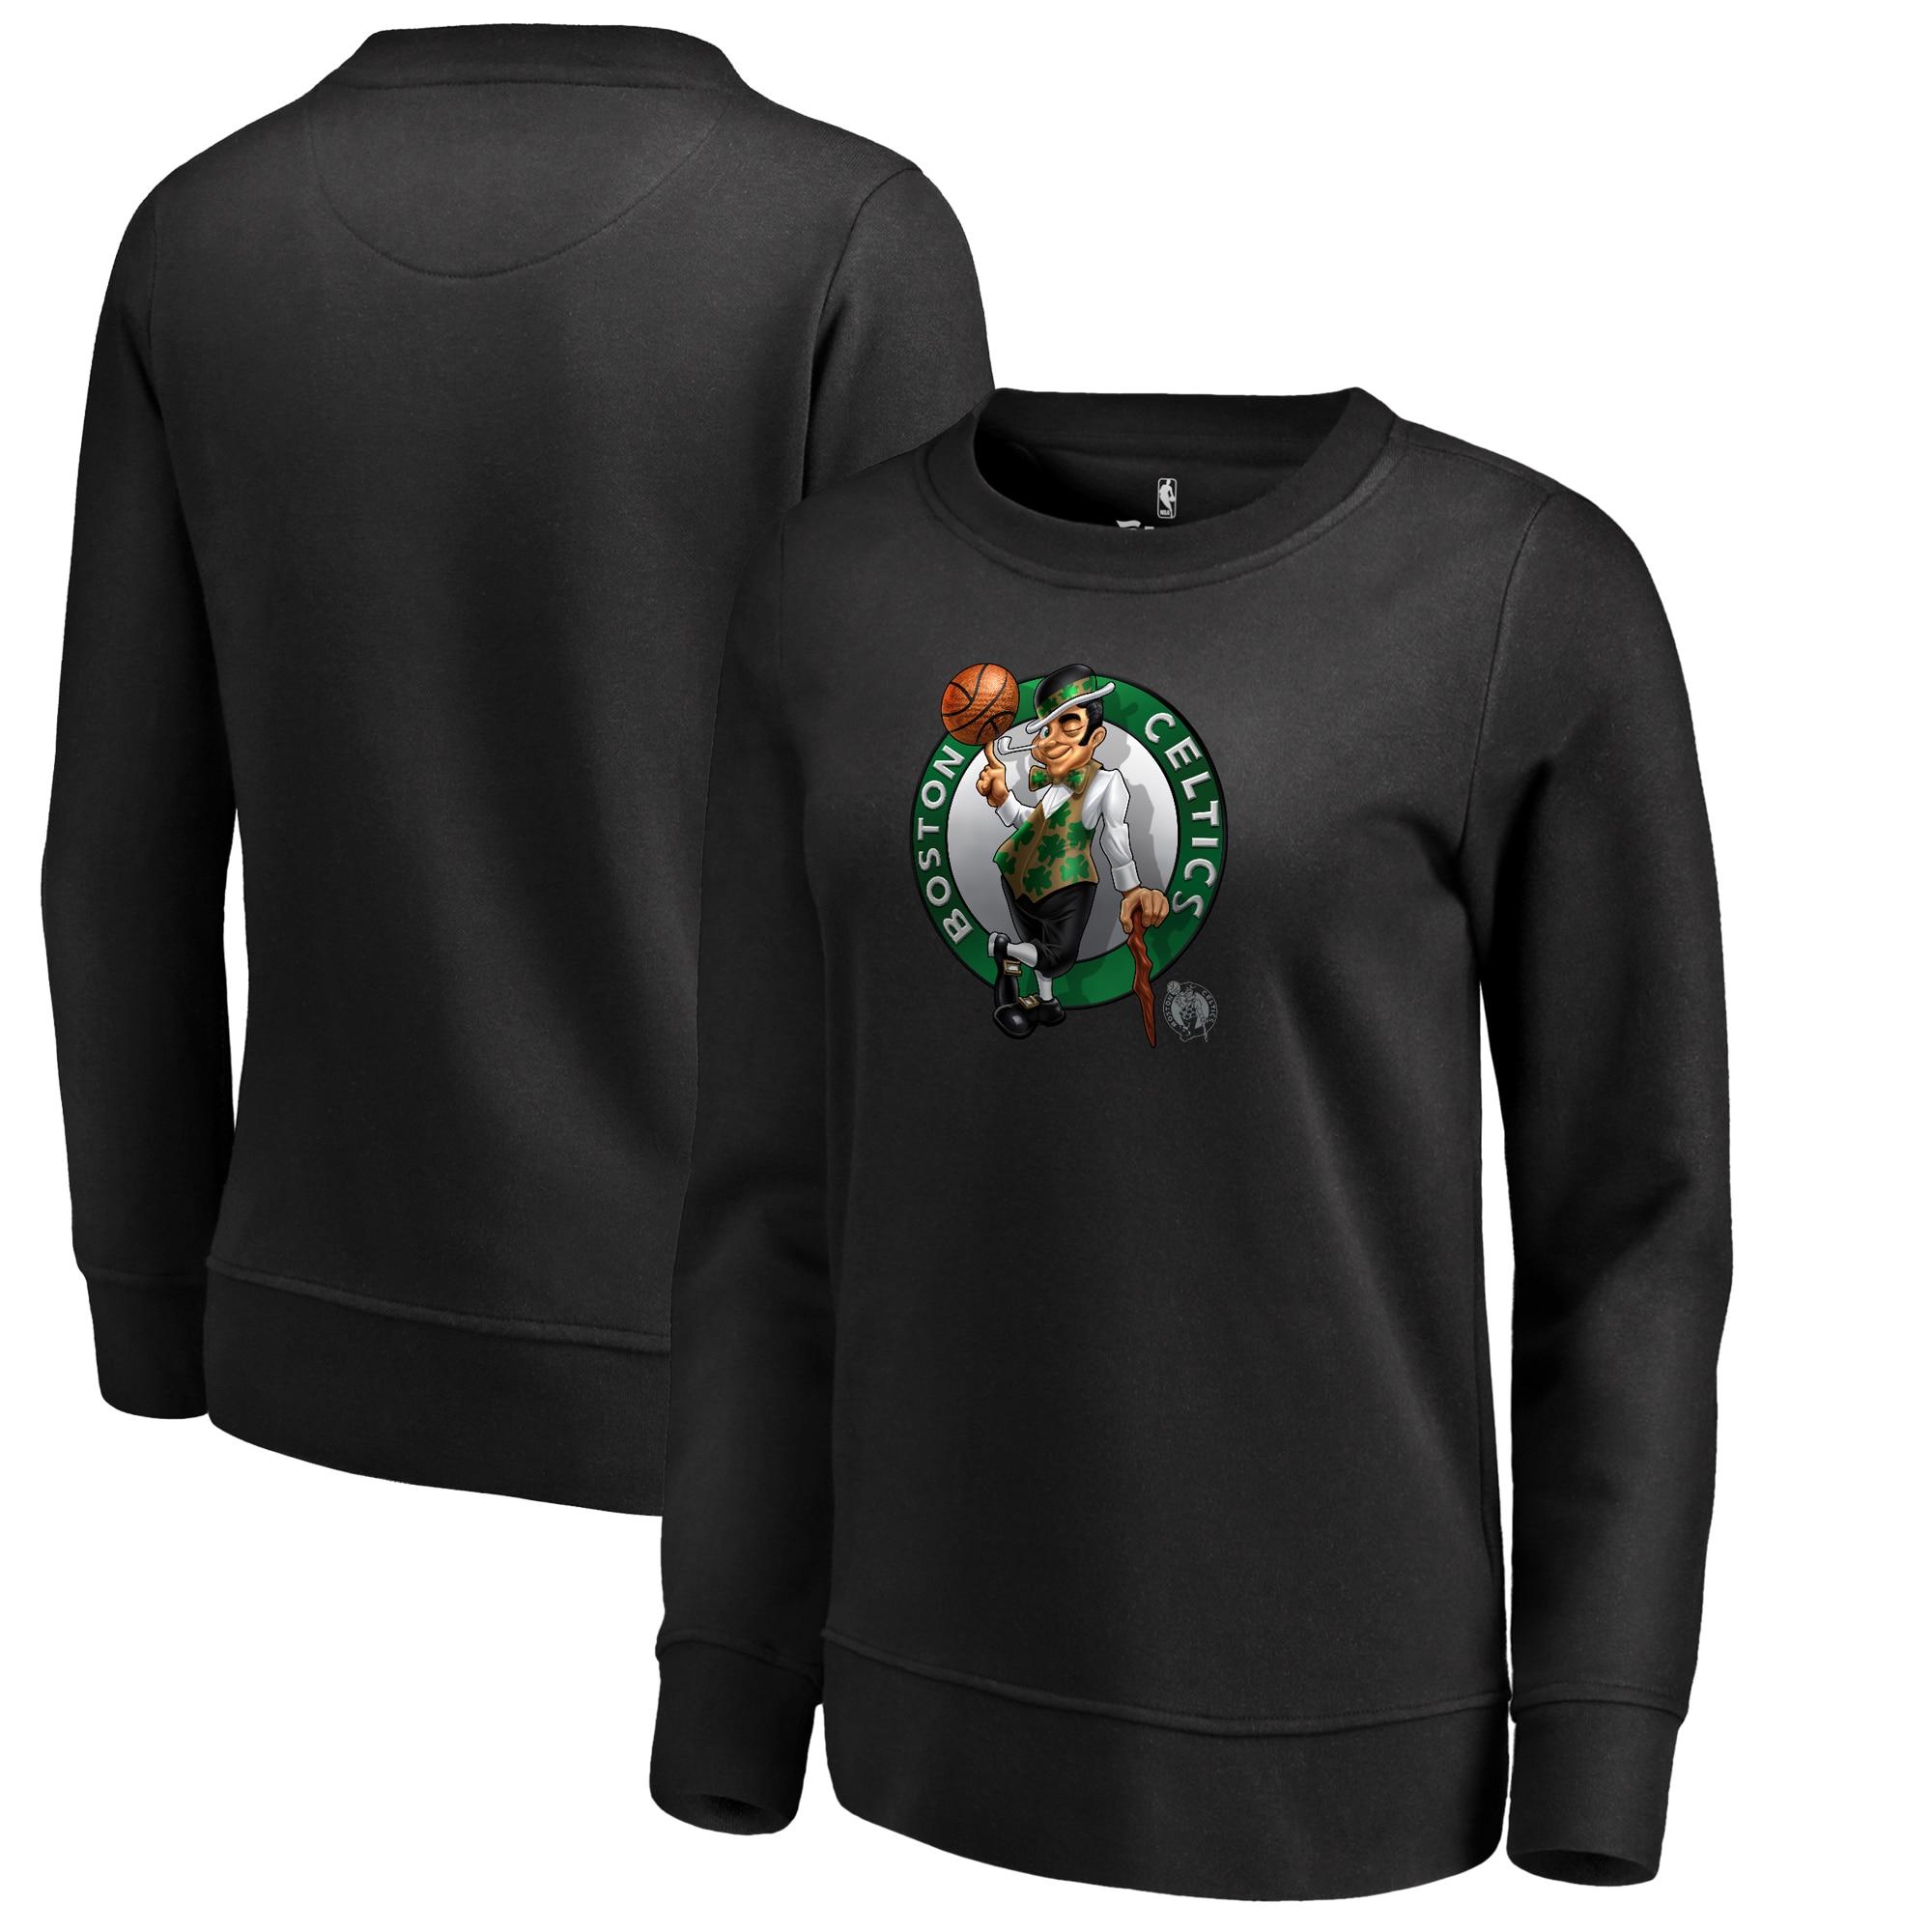 Boston Celtics Fanatics Branded Women's Midnight Mascot Pullover Sweatshirt - Black